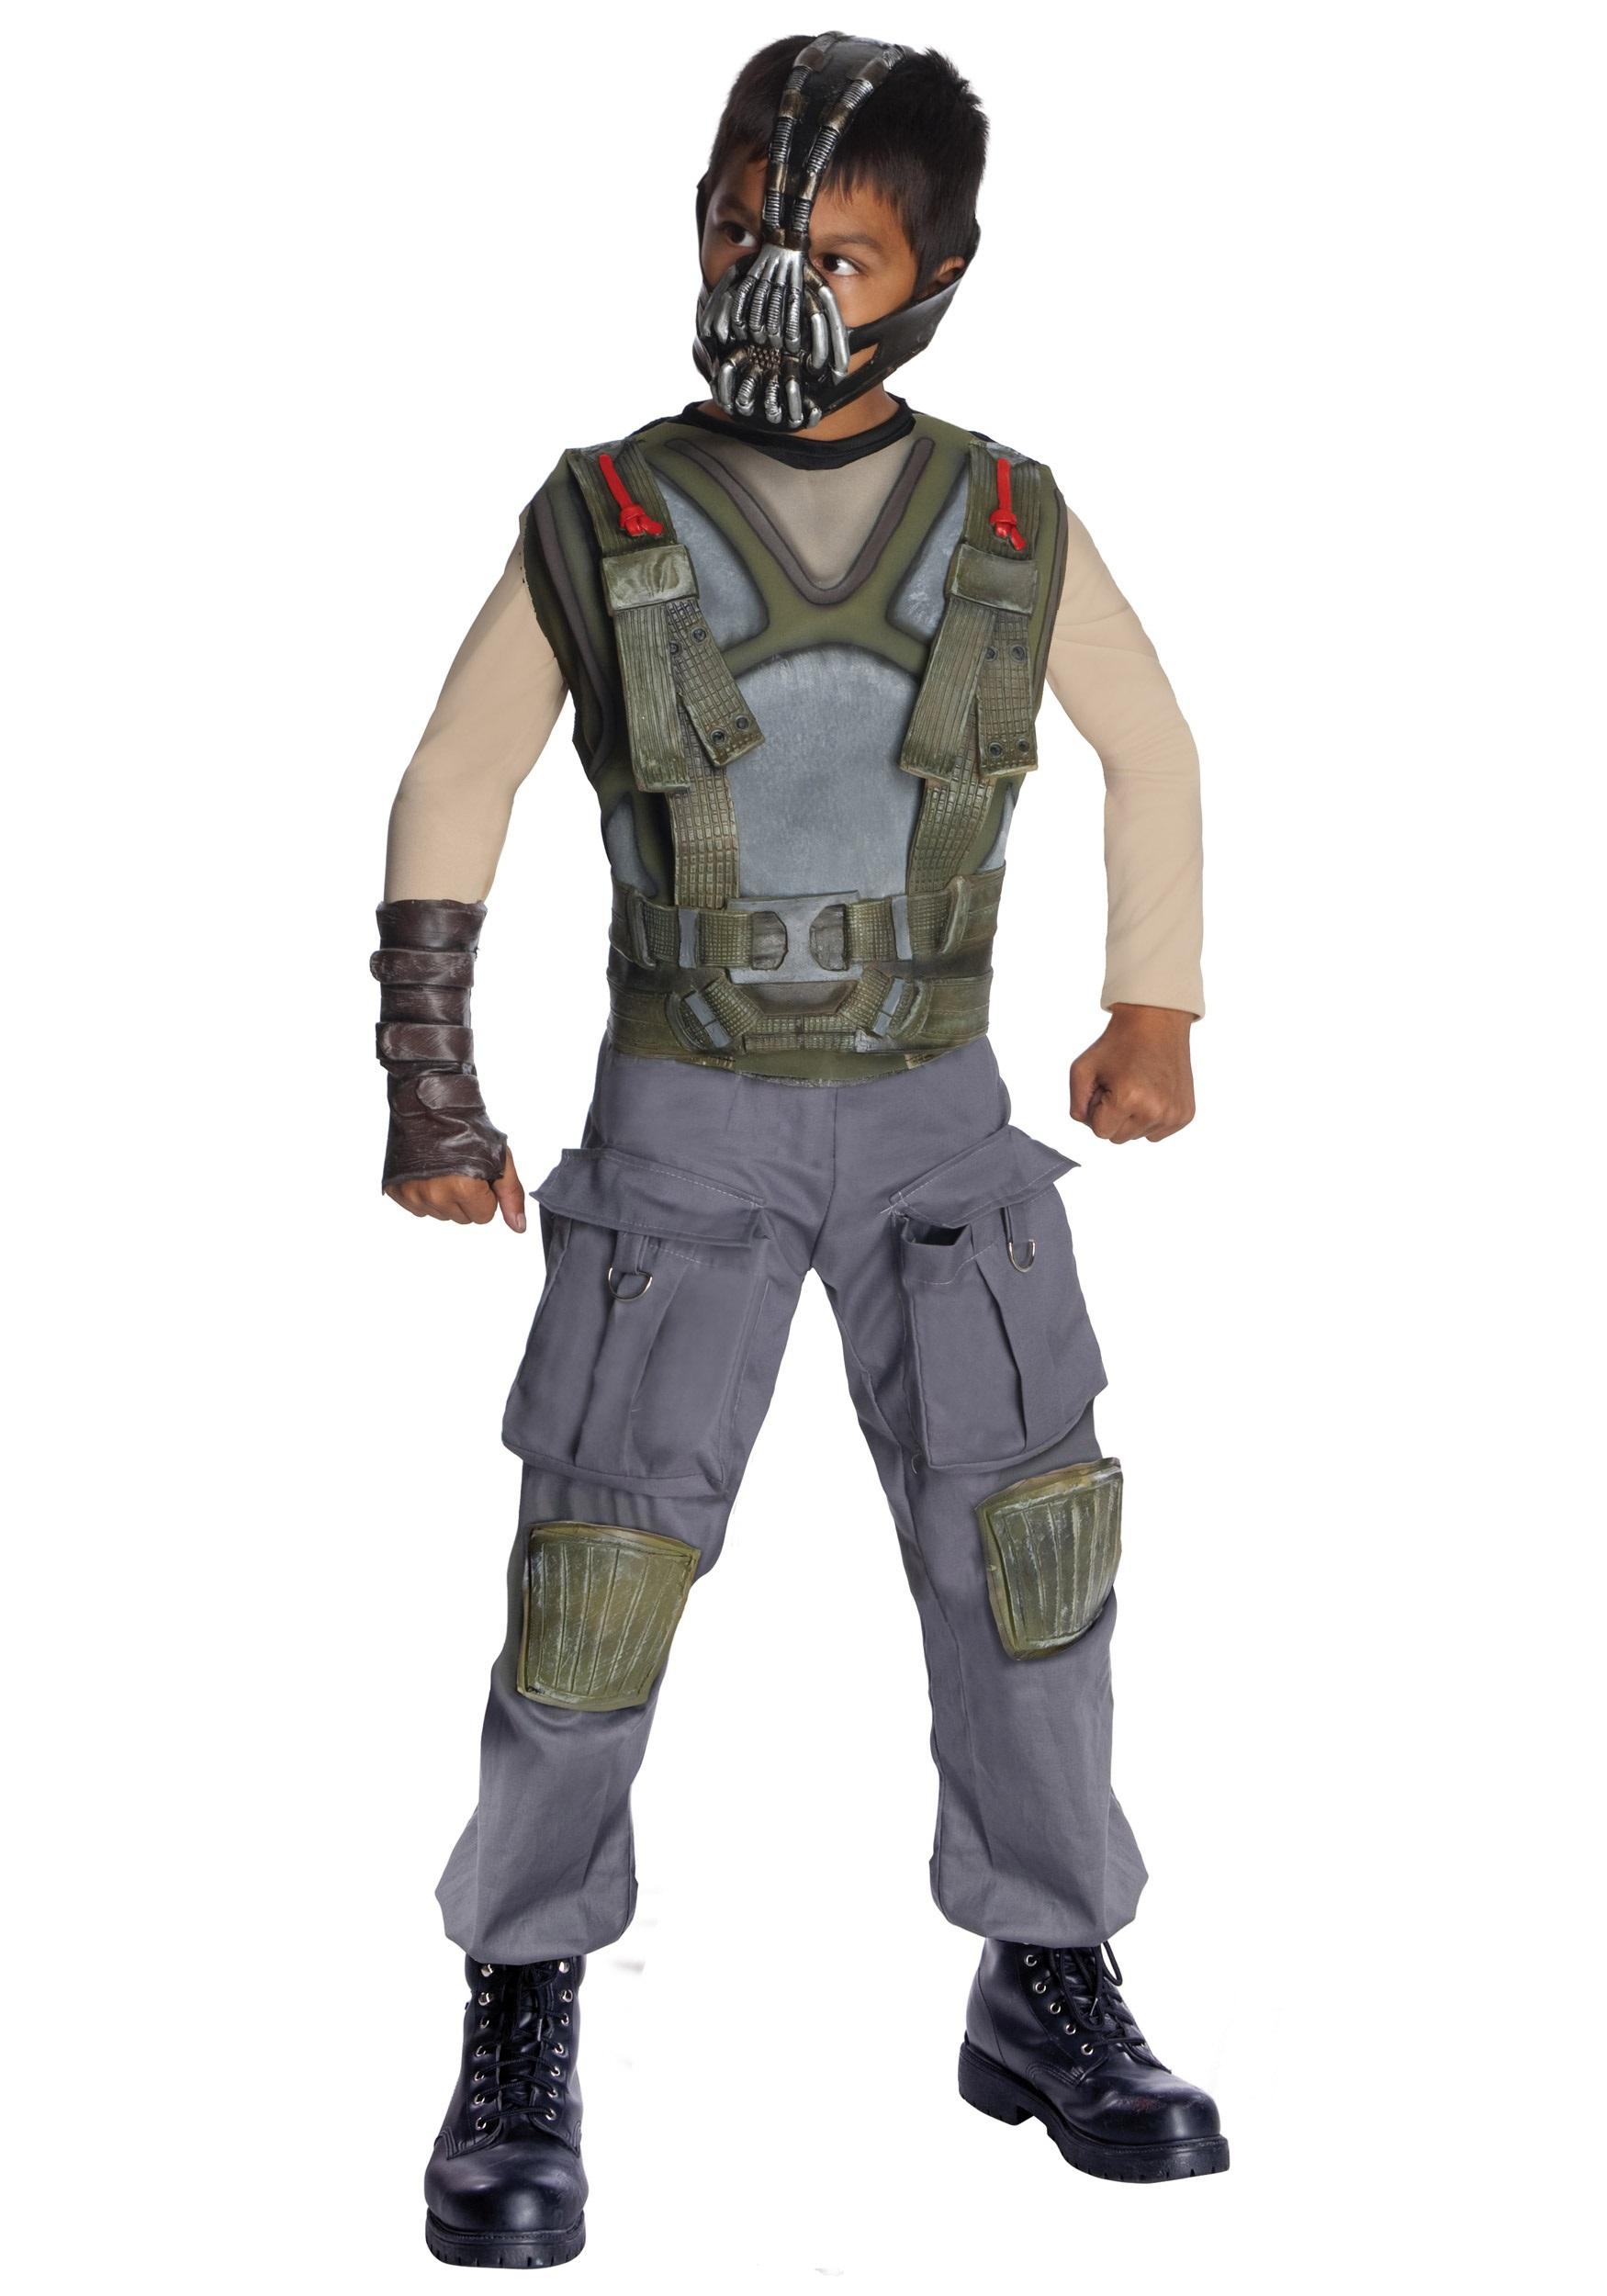 Boys Deluxe Dark Knight Bane Costume  sc 1 st  Halloween Costume & Boys Deluxe Dark Knight Bane Costume - Children Batman Villain ...